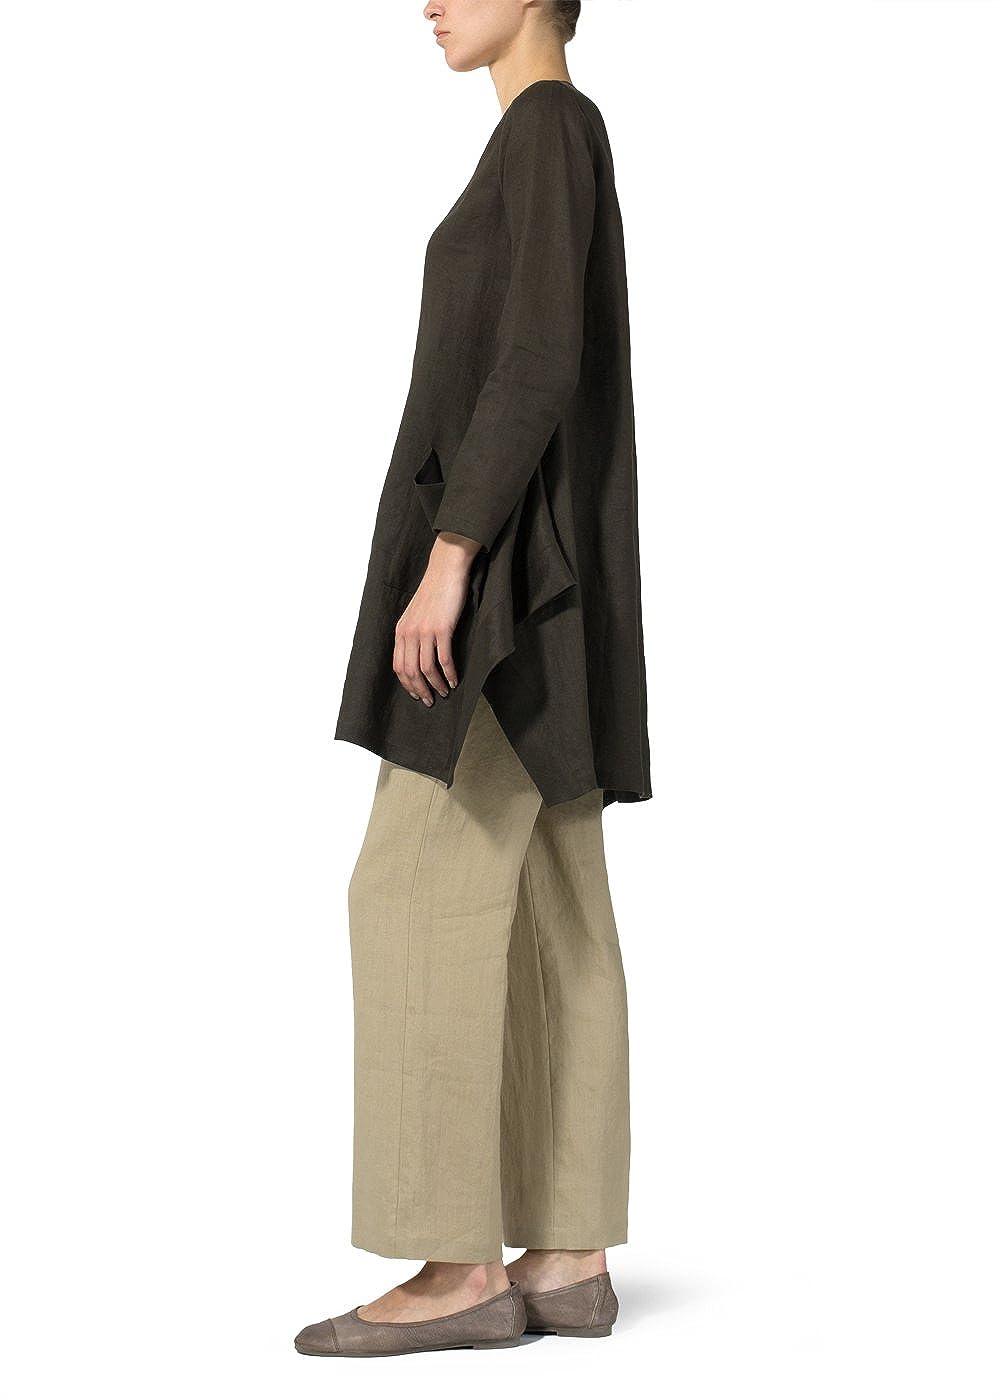 Vivid Linen Long Sleeve Top